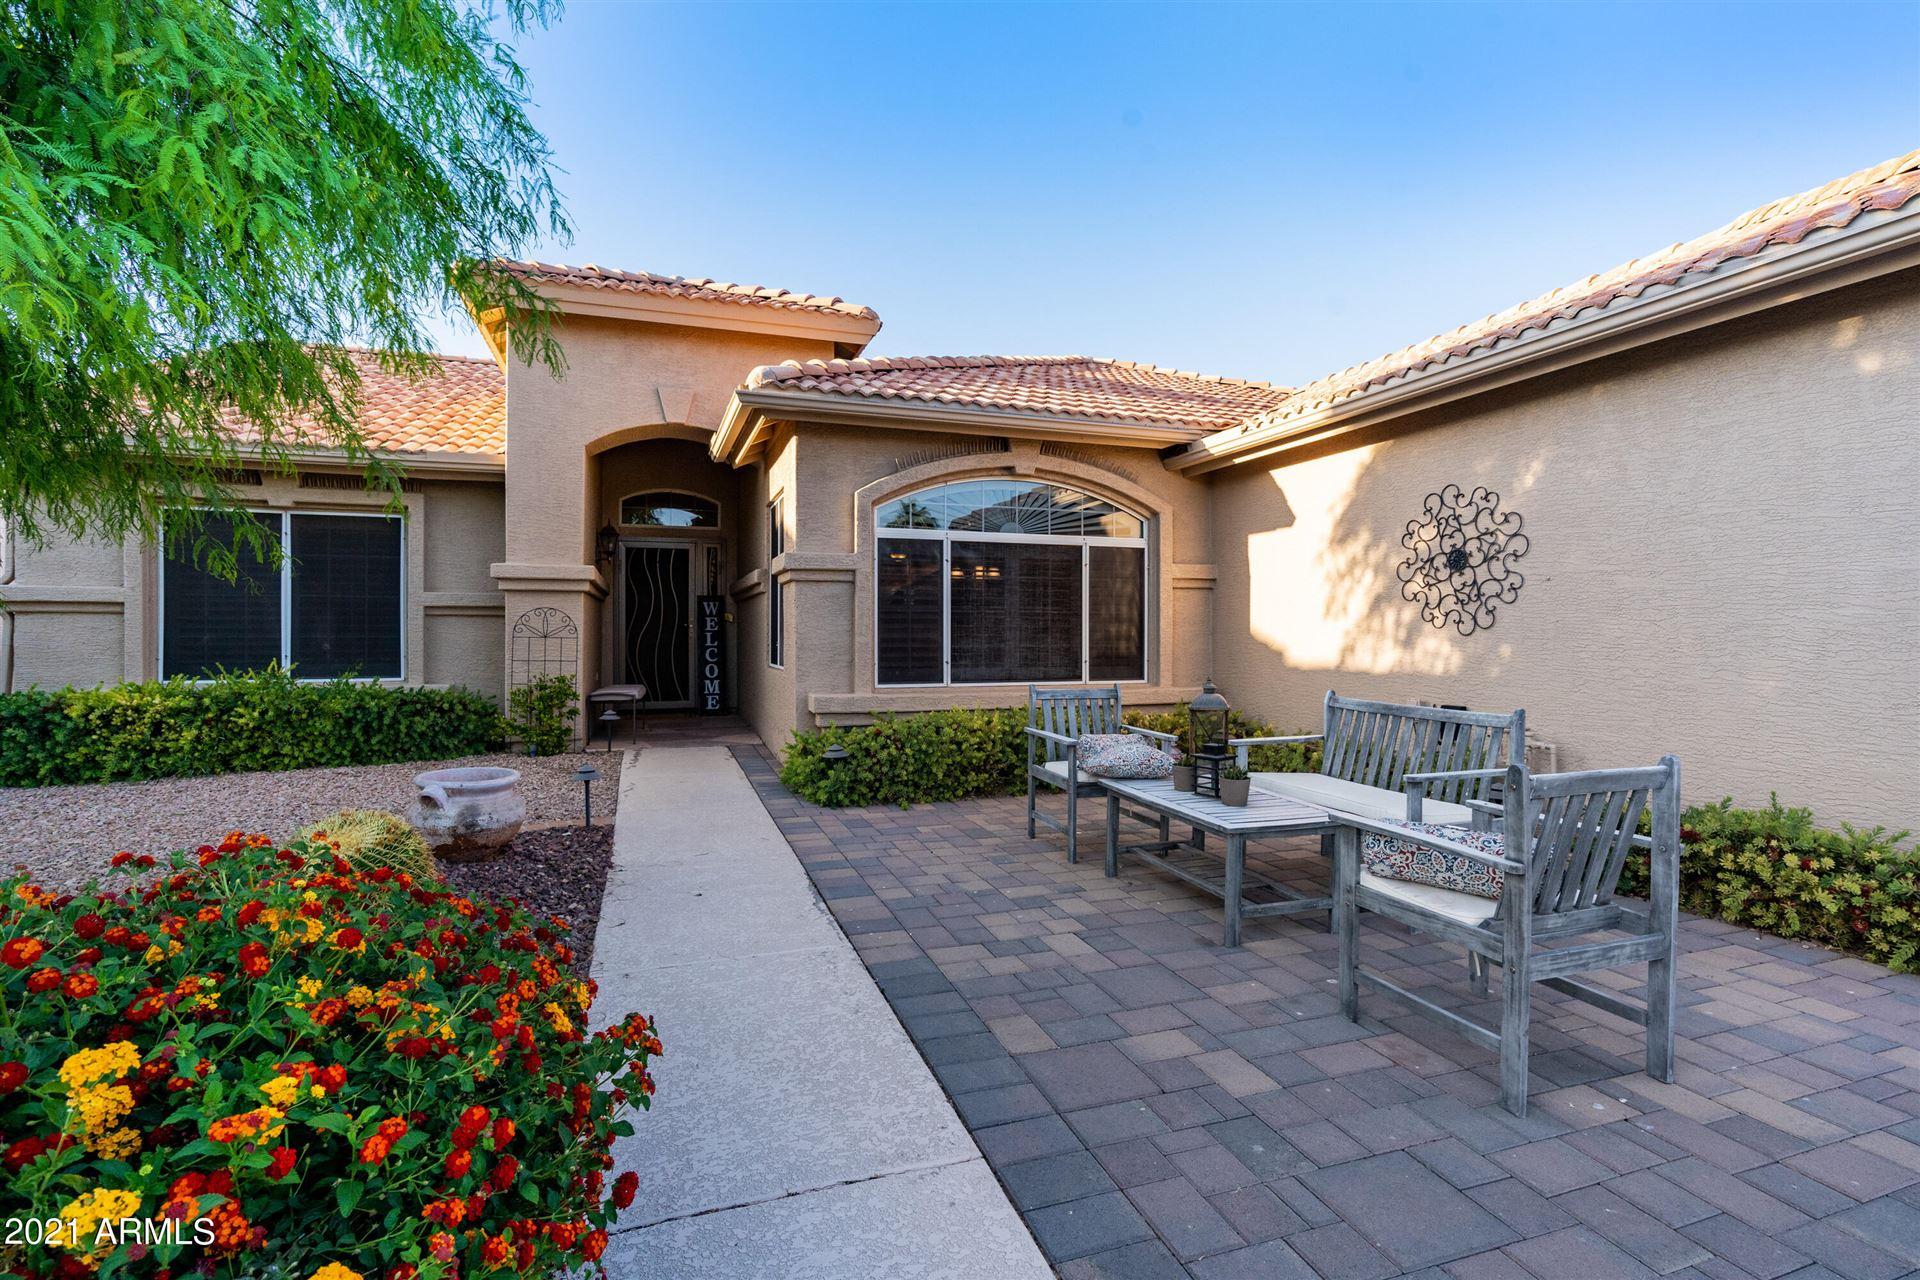 Photo of 8910 E HERCULES Court, Sun Lakes, AZ 85248 (MLS # 6231203)